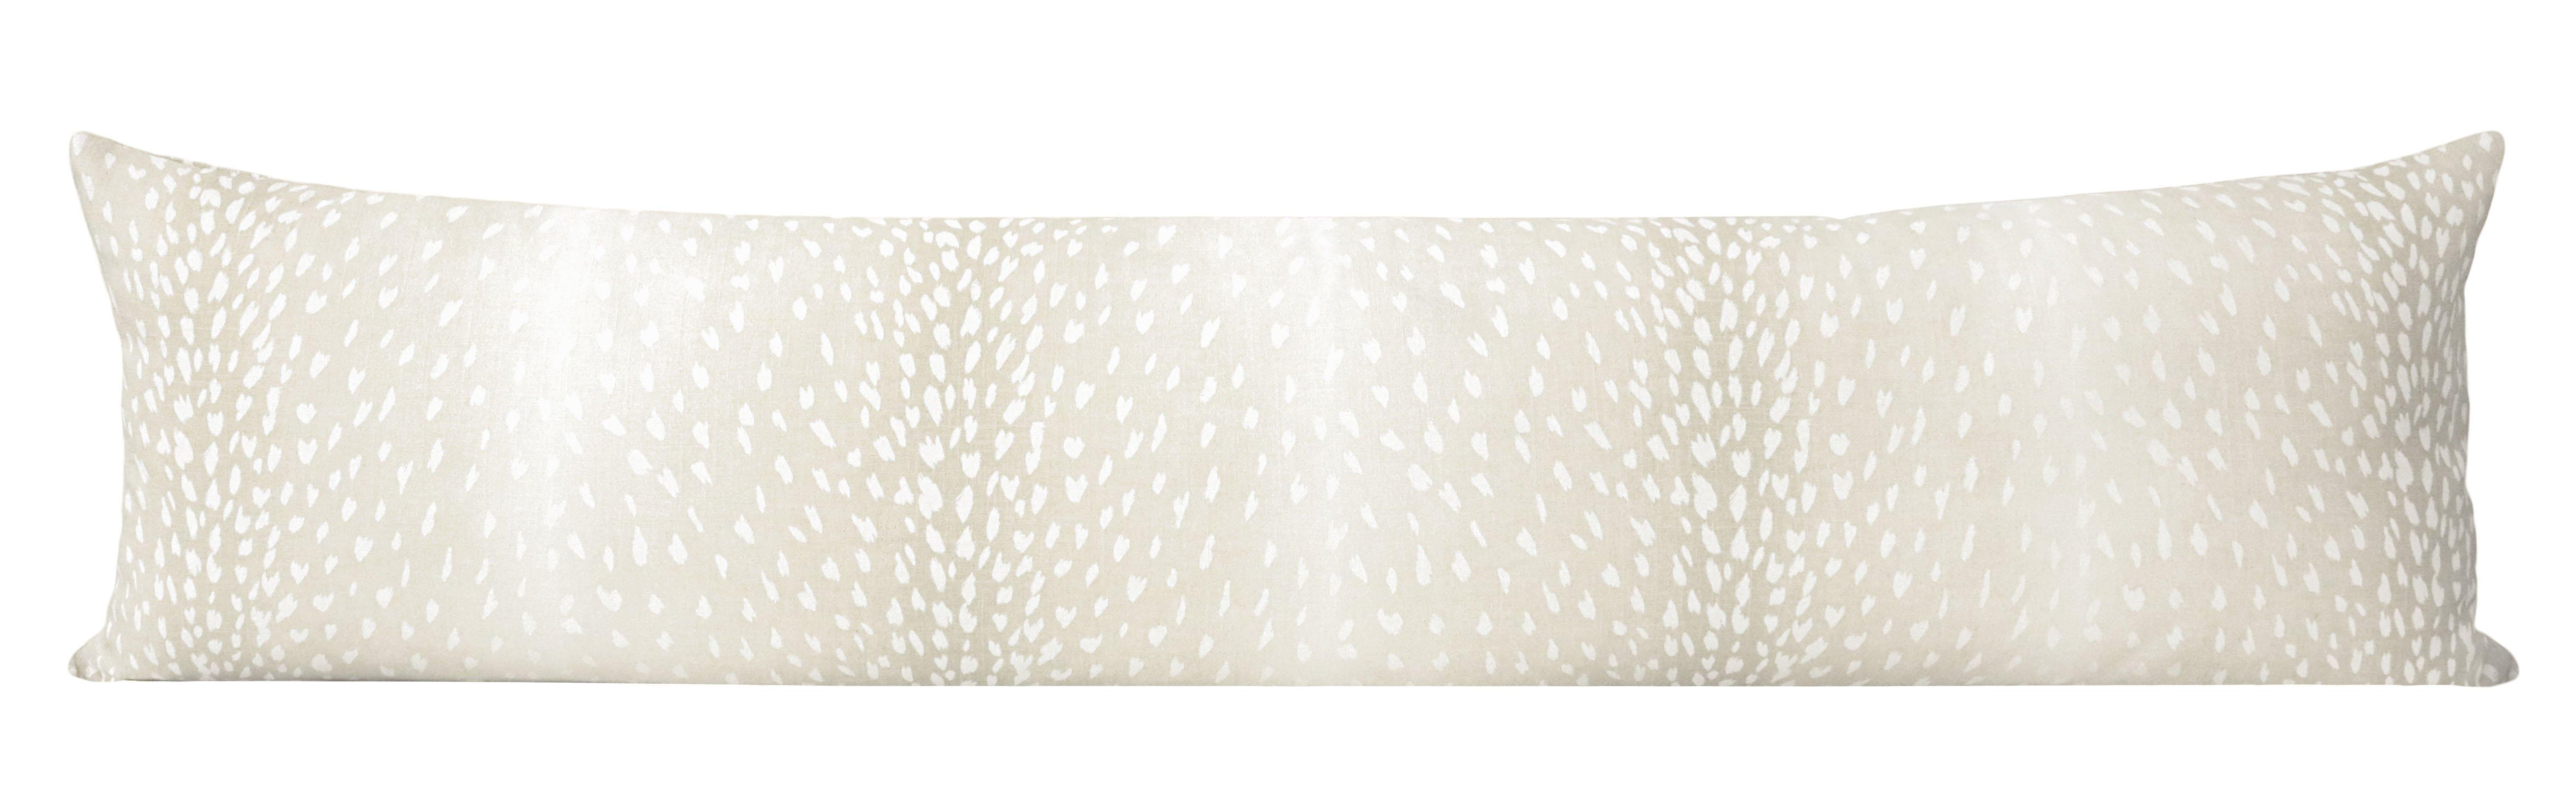 "The XL Lumbar :: Antelope Linen Print // Cashmere - 14"" X 48"""